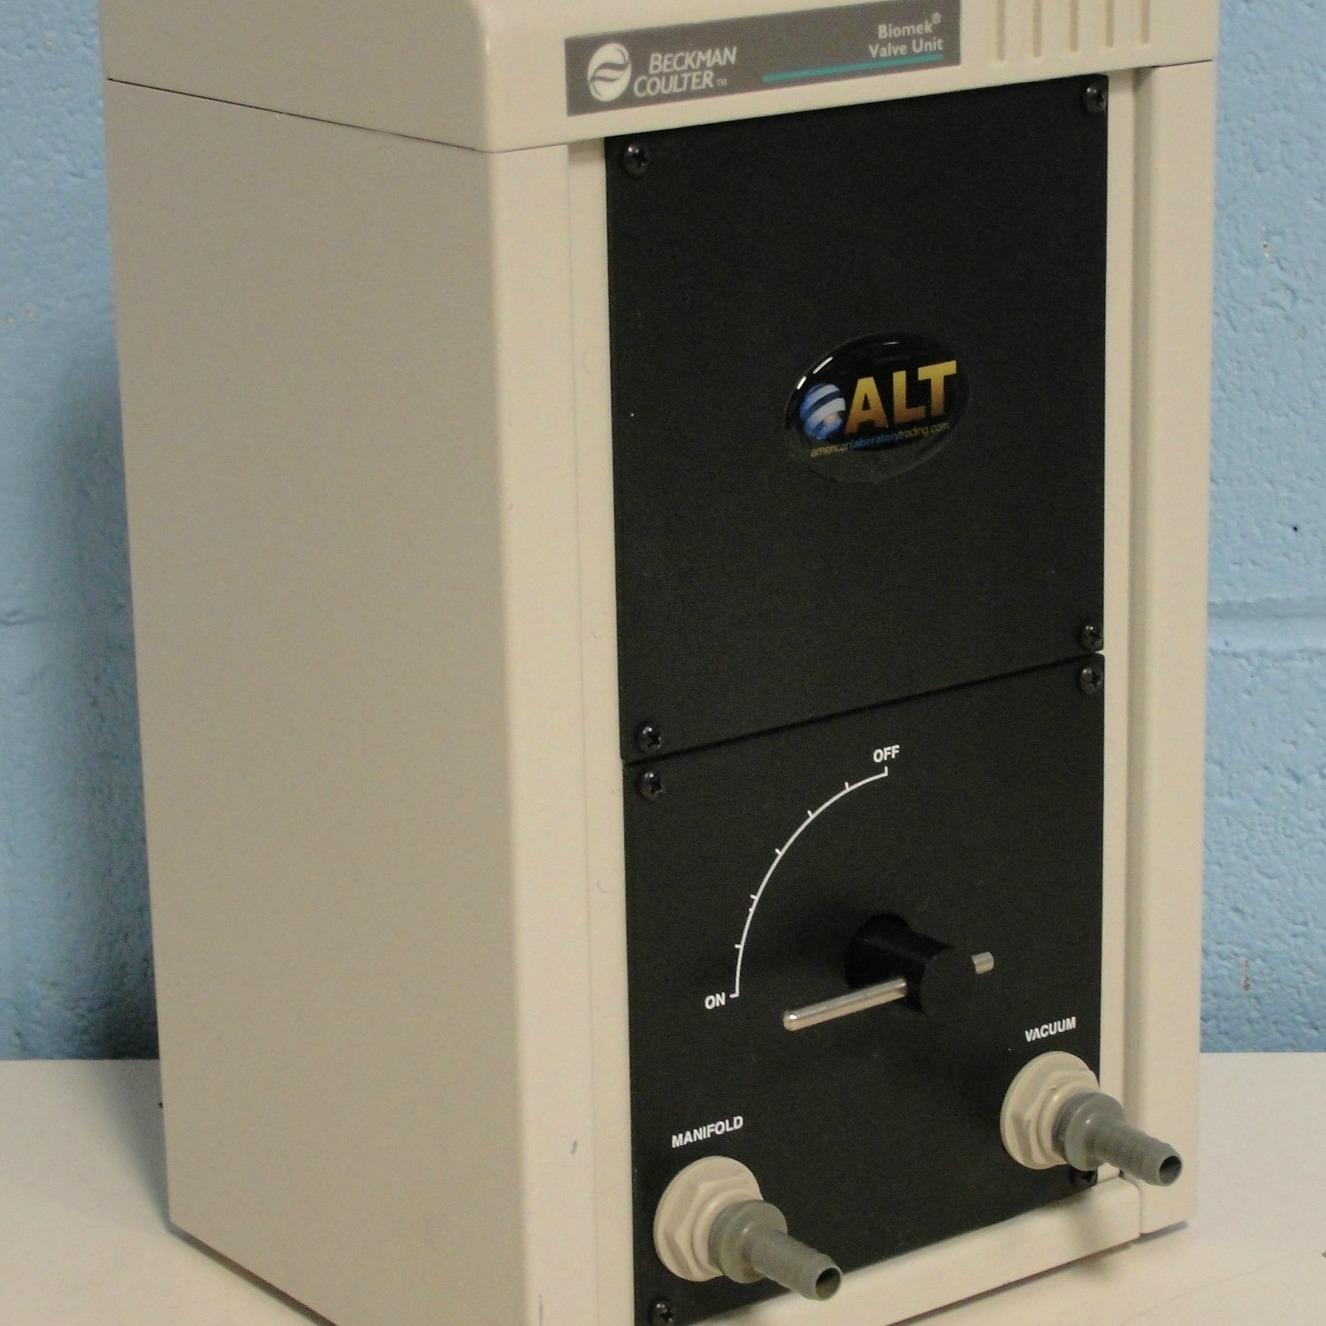 Beckman Coulter 719657 Biomek Vacuum Valve Unit Image